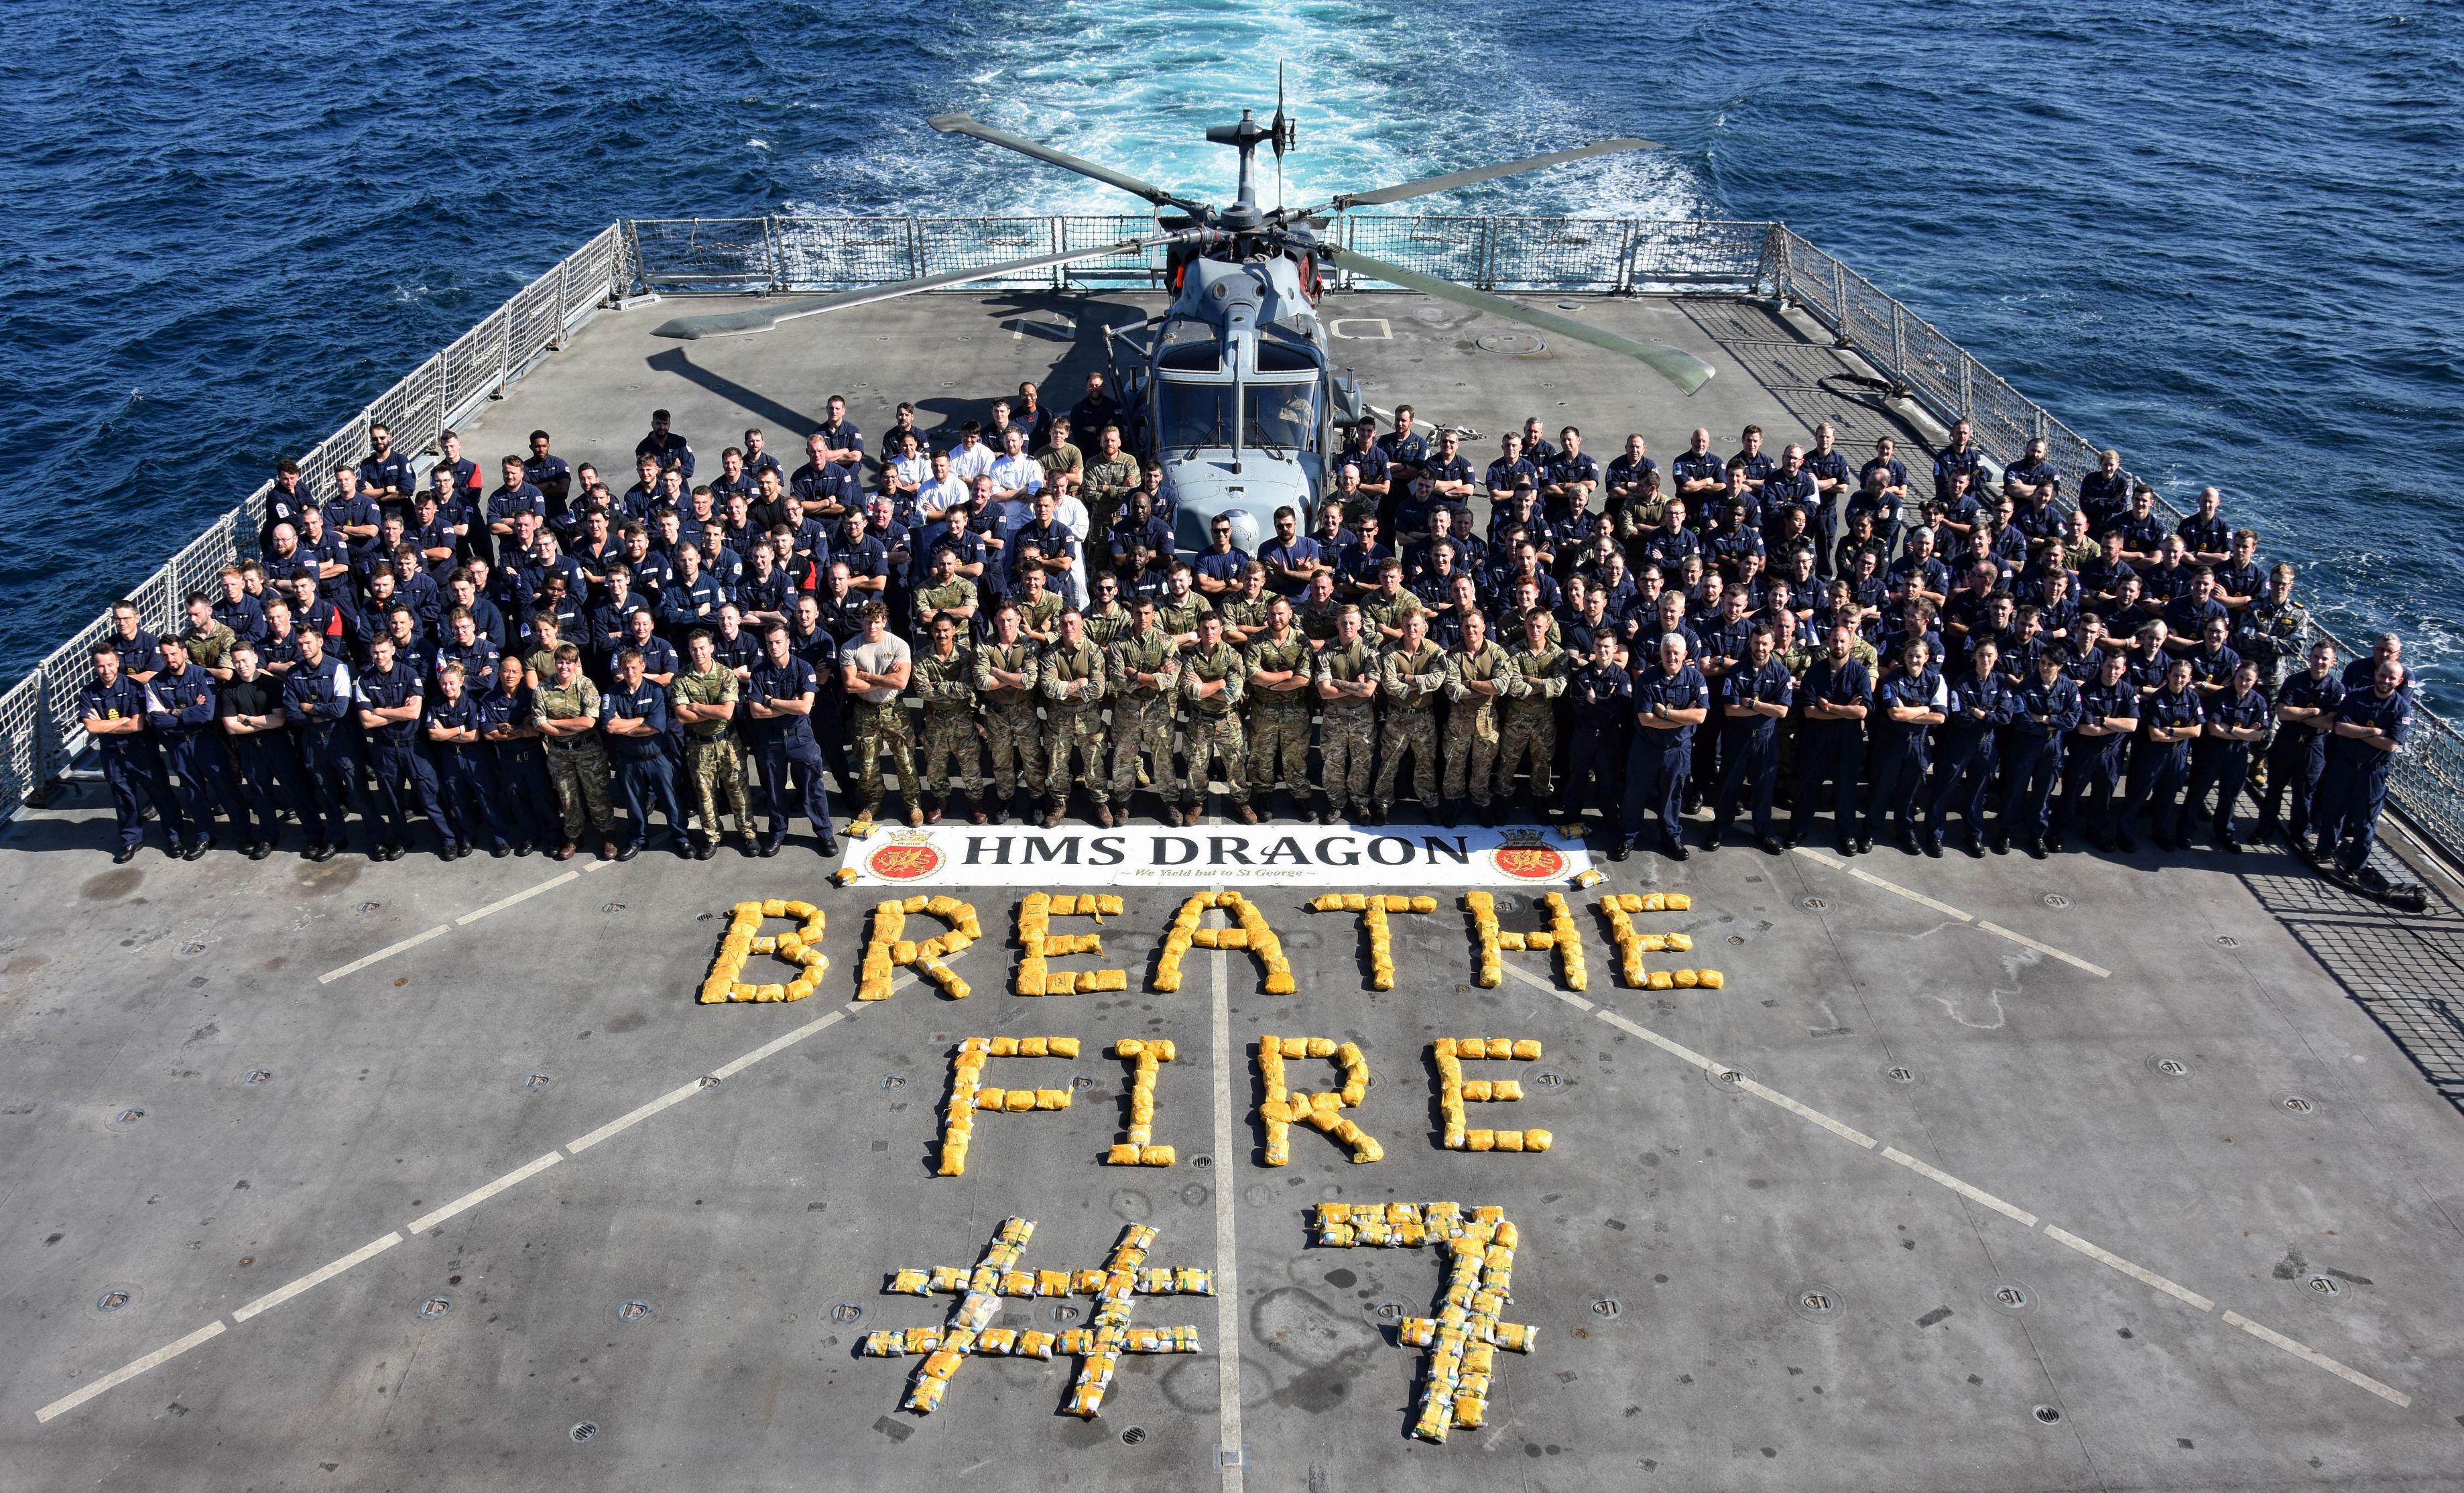 HMS Dragon 7th drugs bust